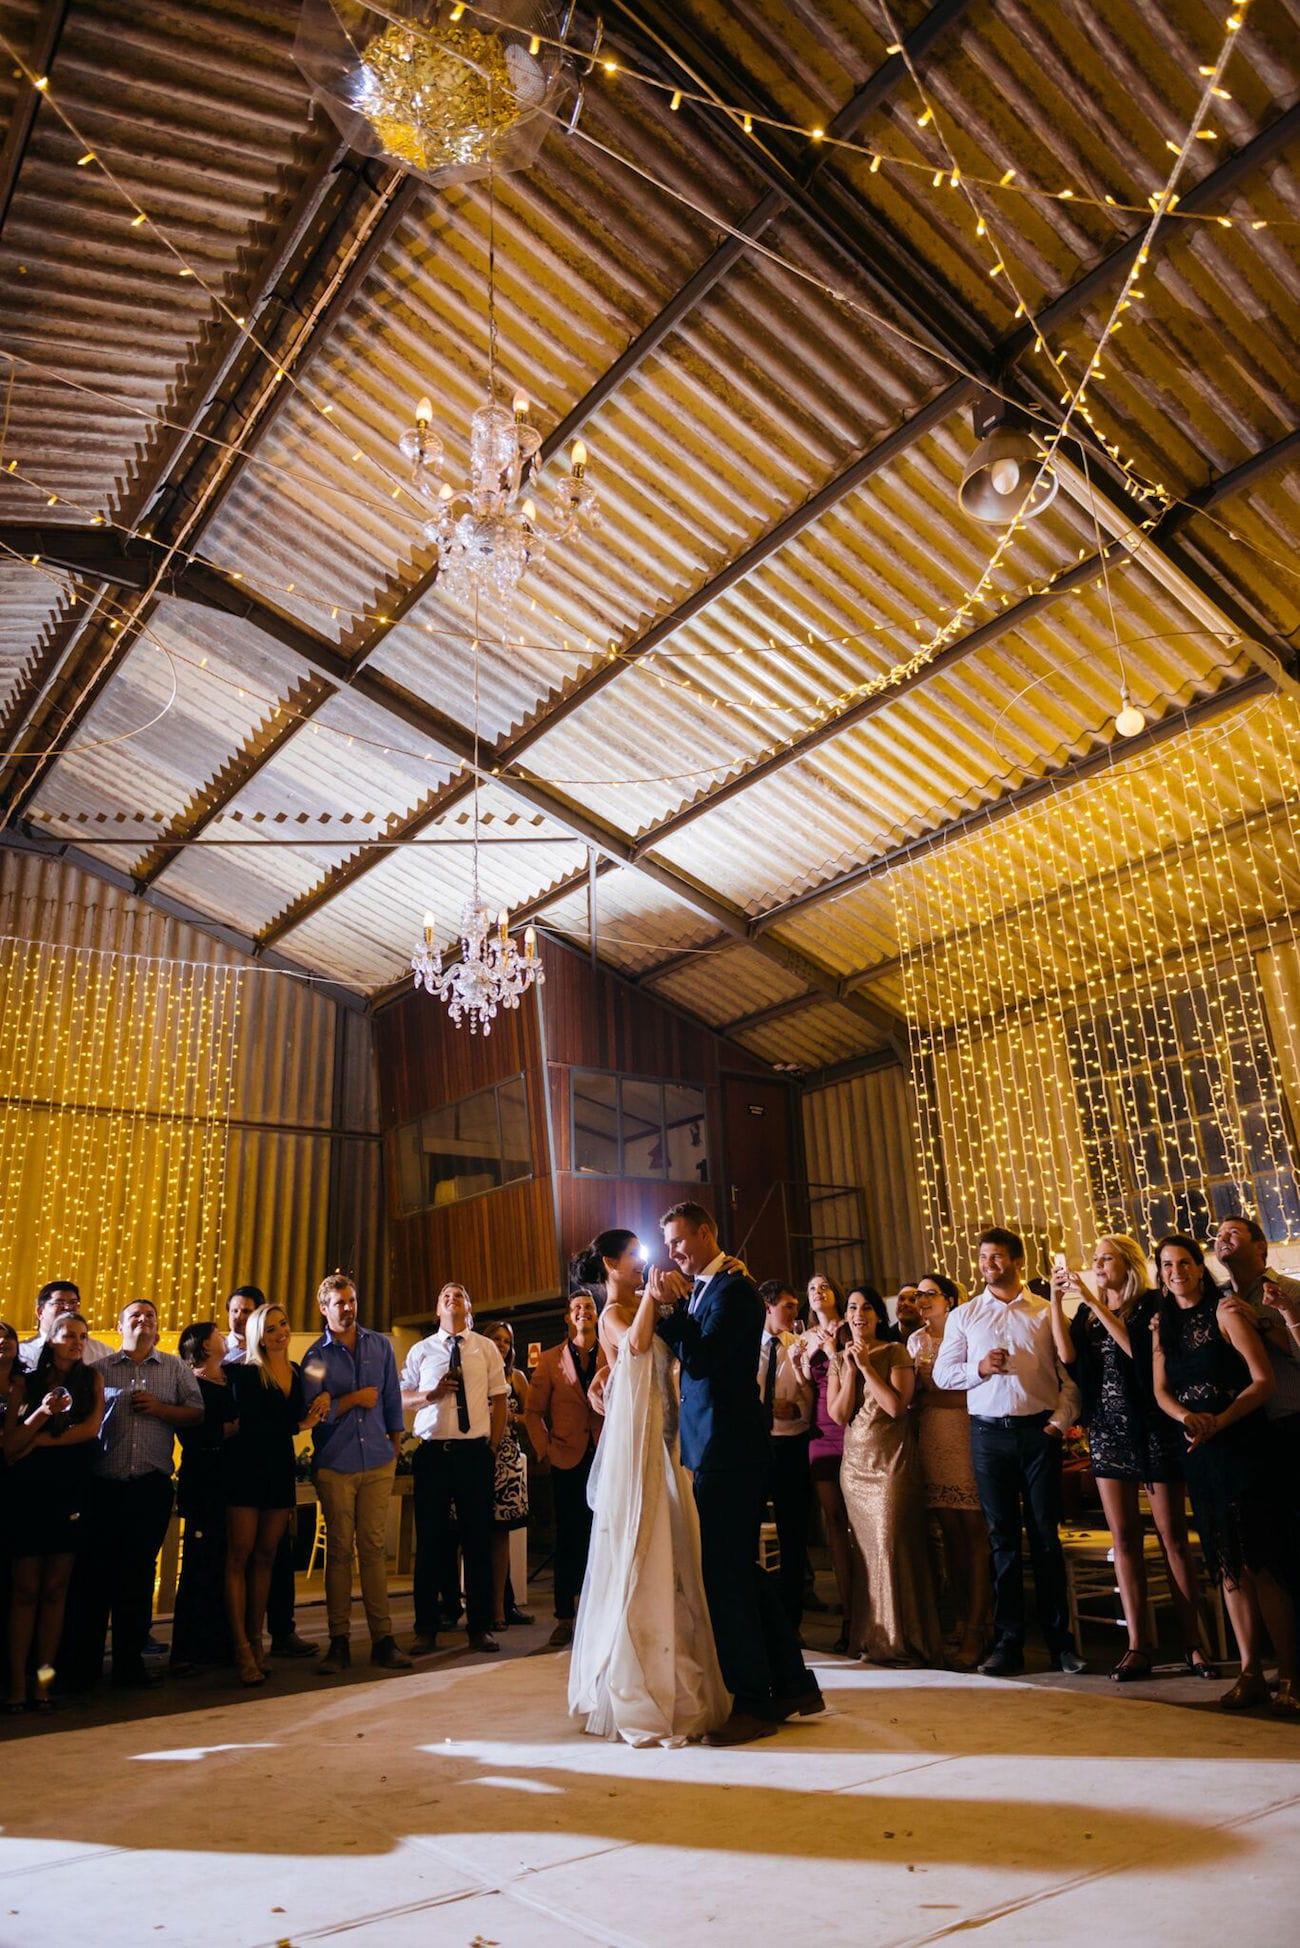 Rustic barn wedding first dance | Credit: Matthew Carr